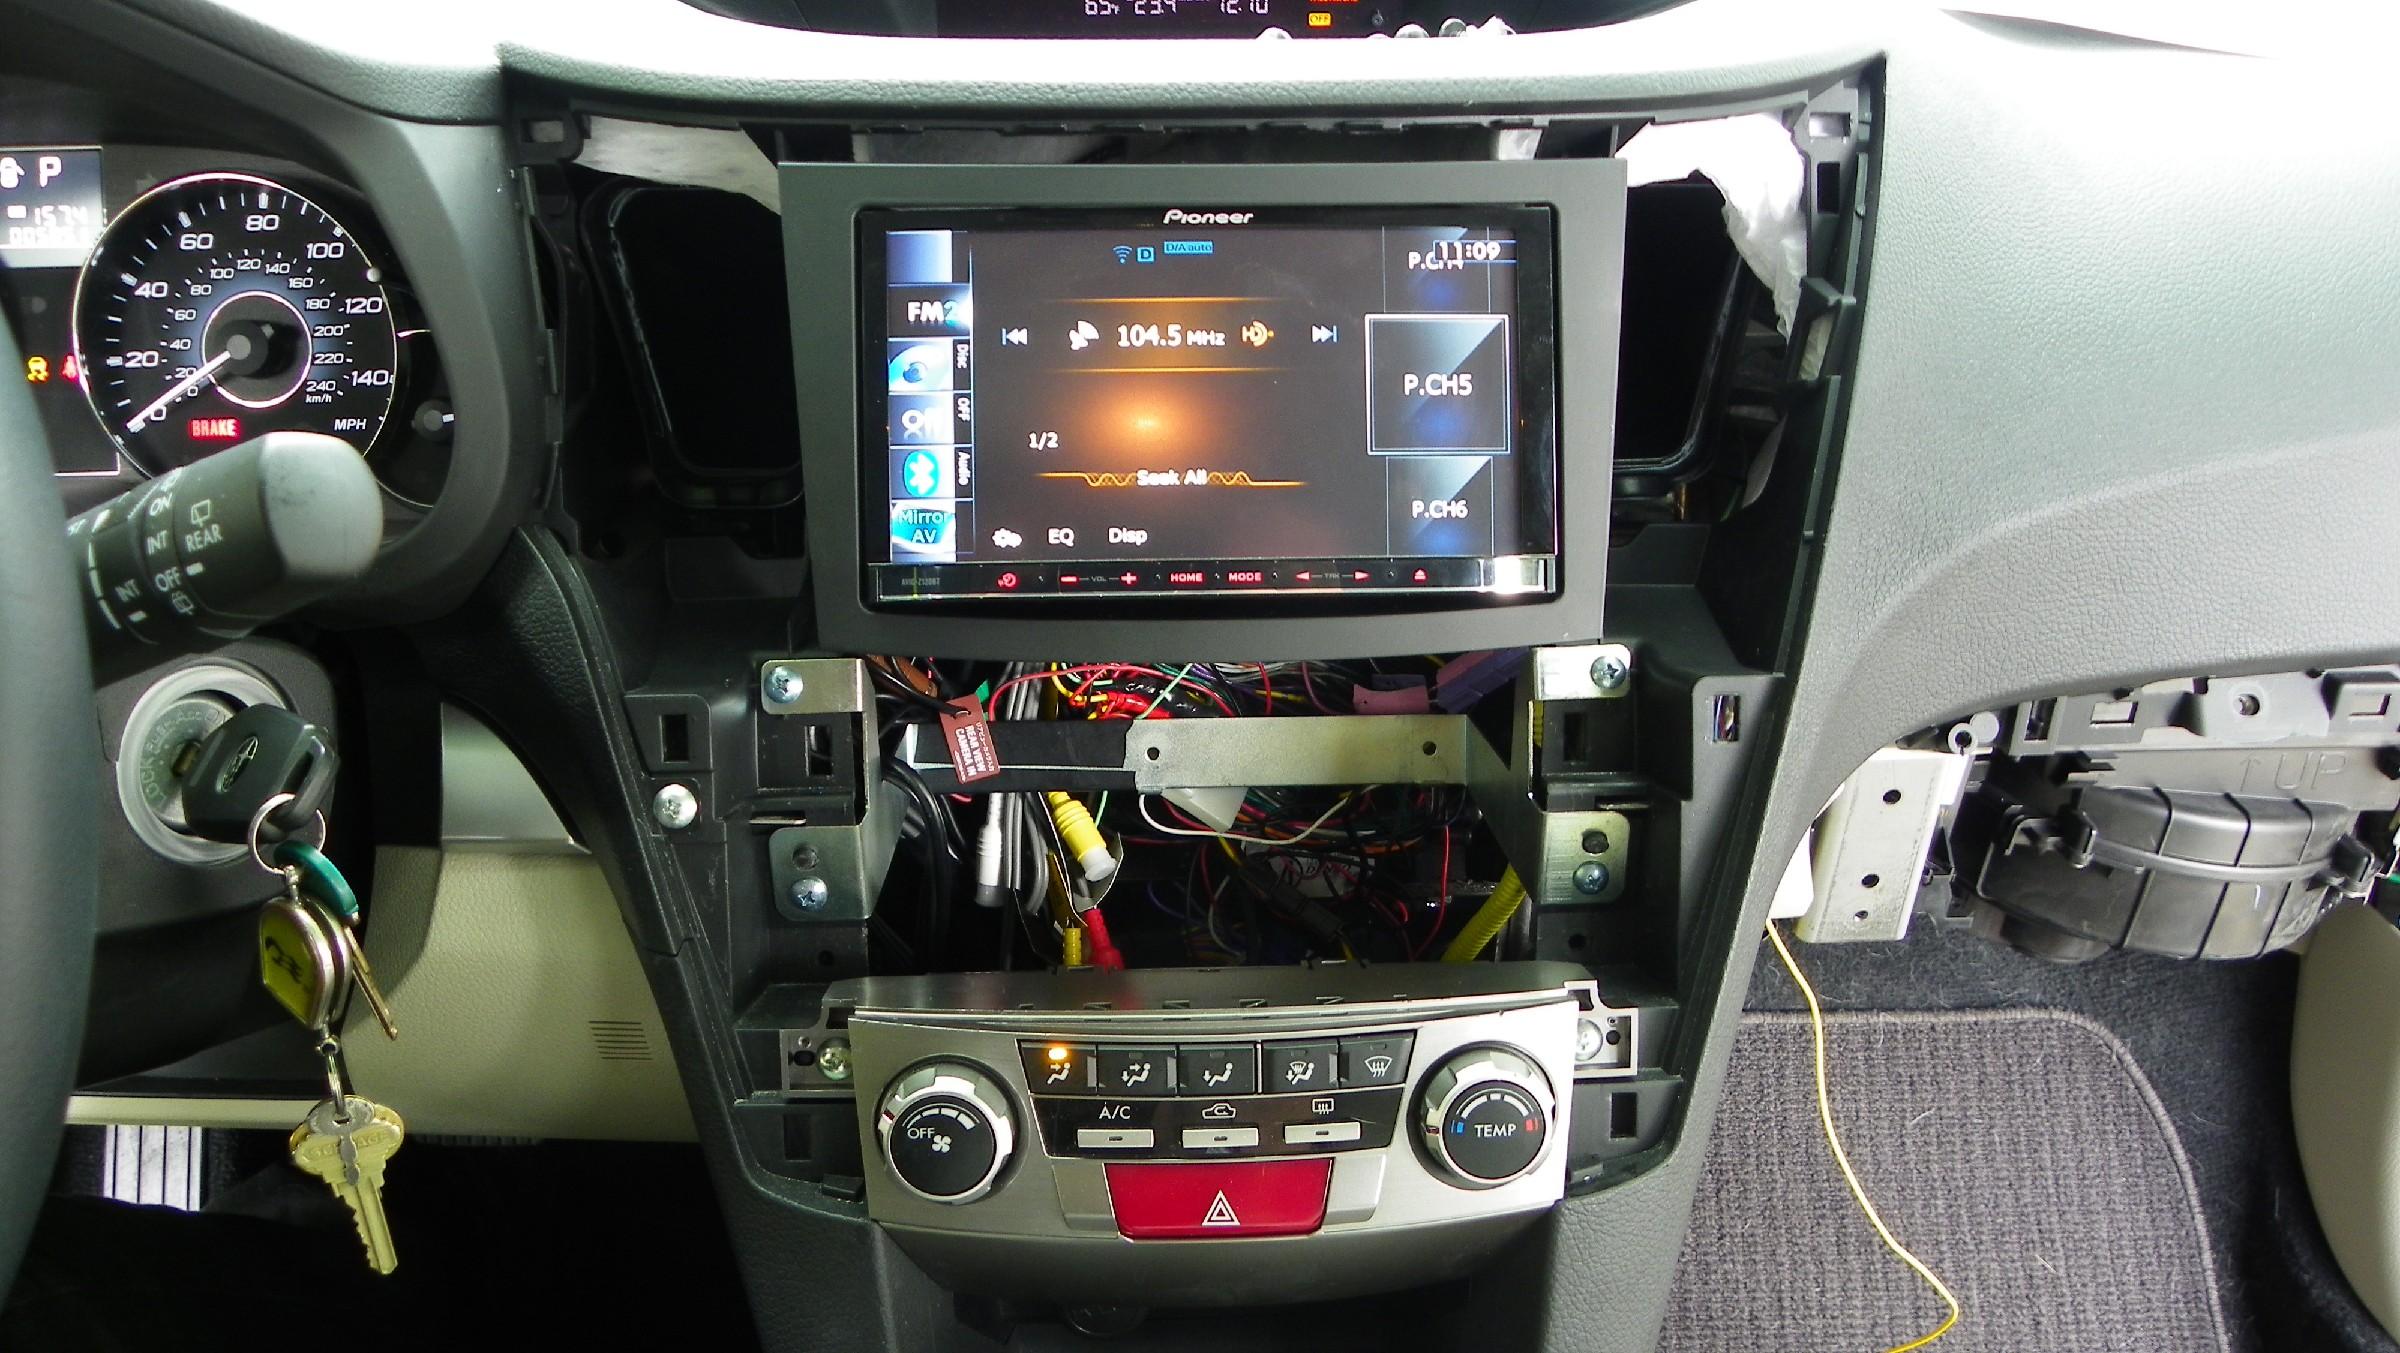 D Aftermarket Stereo Pioneer Install on Harman Kardon Car Stereo